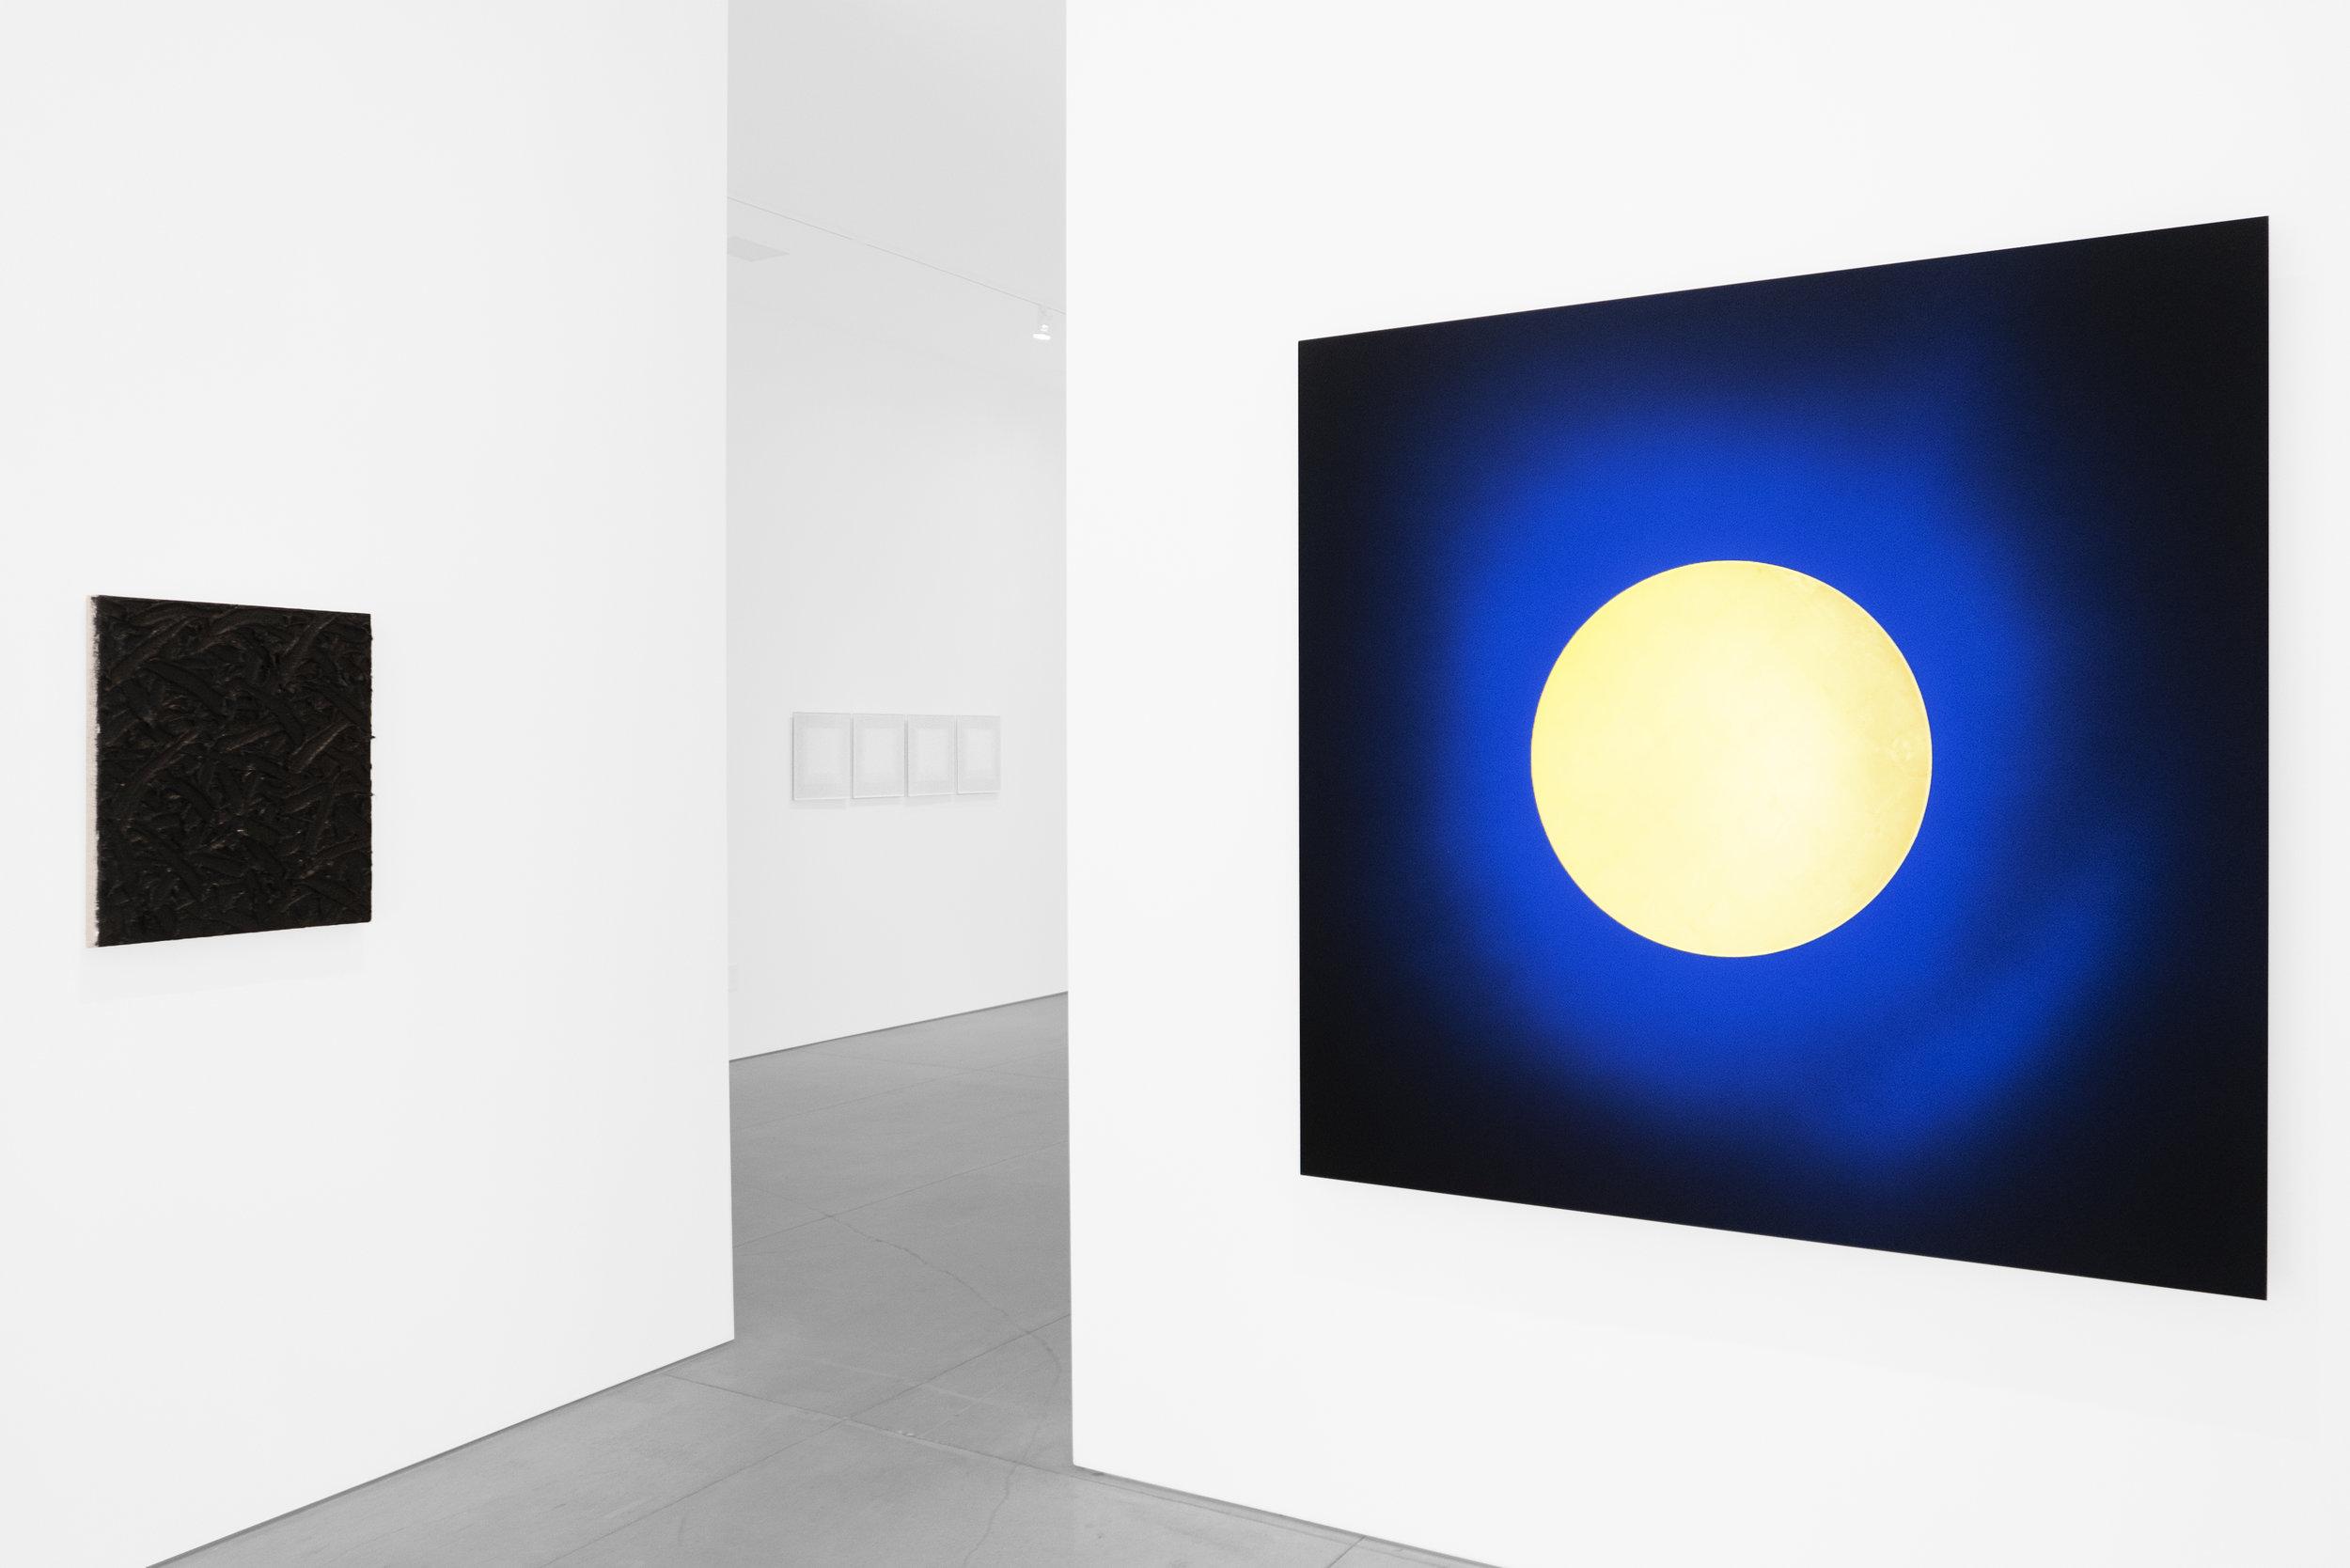 25 Years_Peter Blake Gallery_2019_Installation View_9.jpg